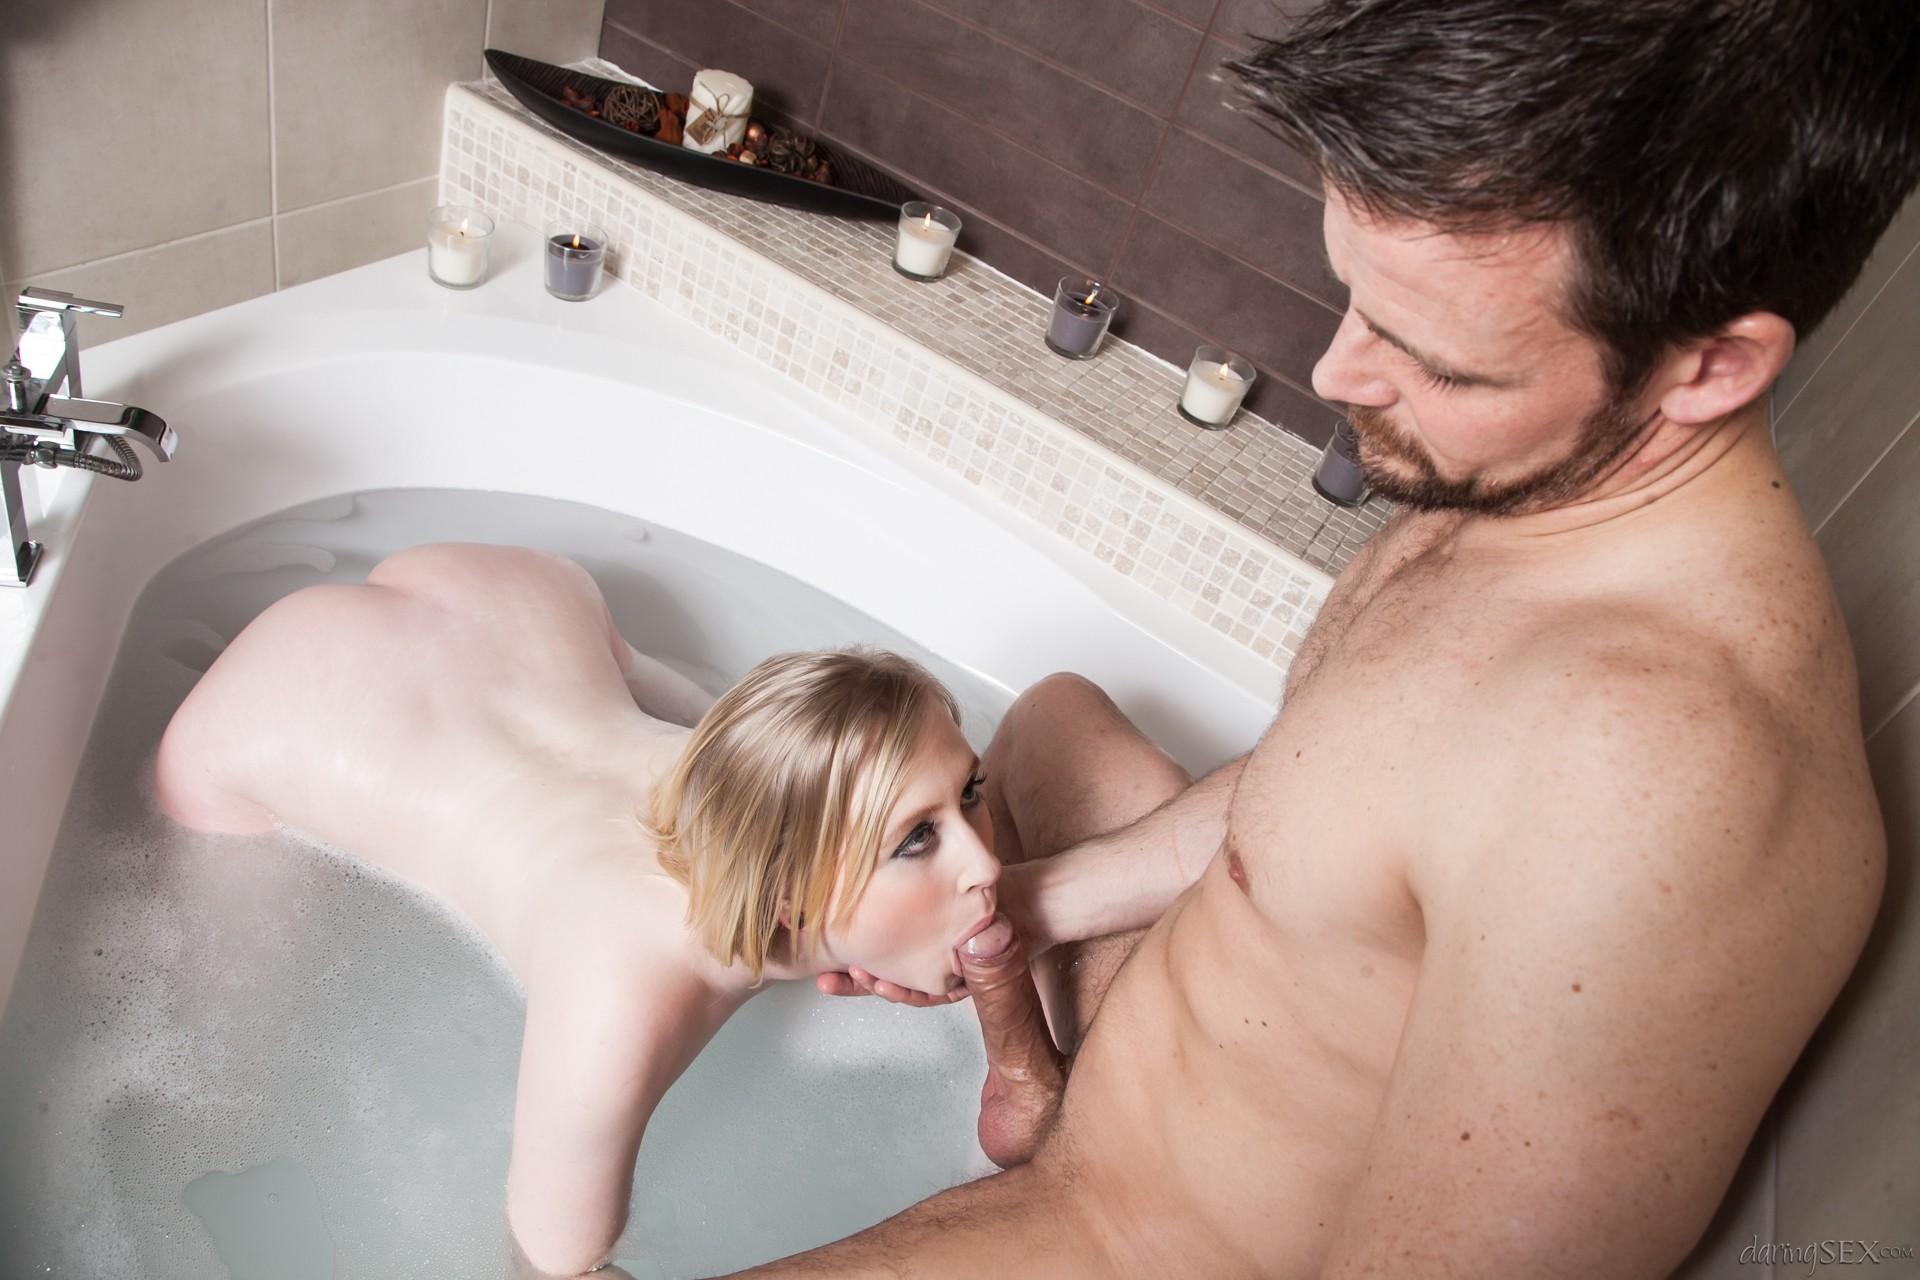 найти секс в ванной видео сахно